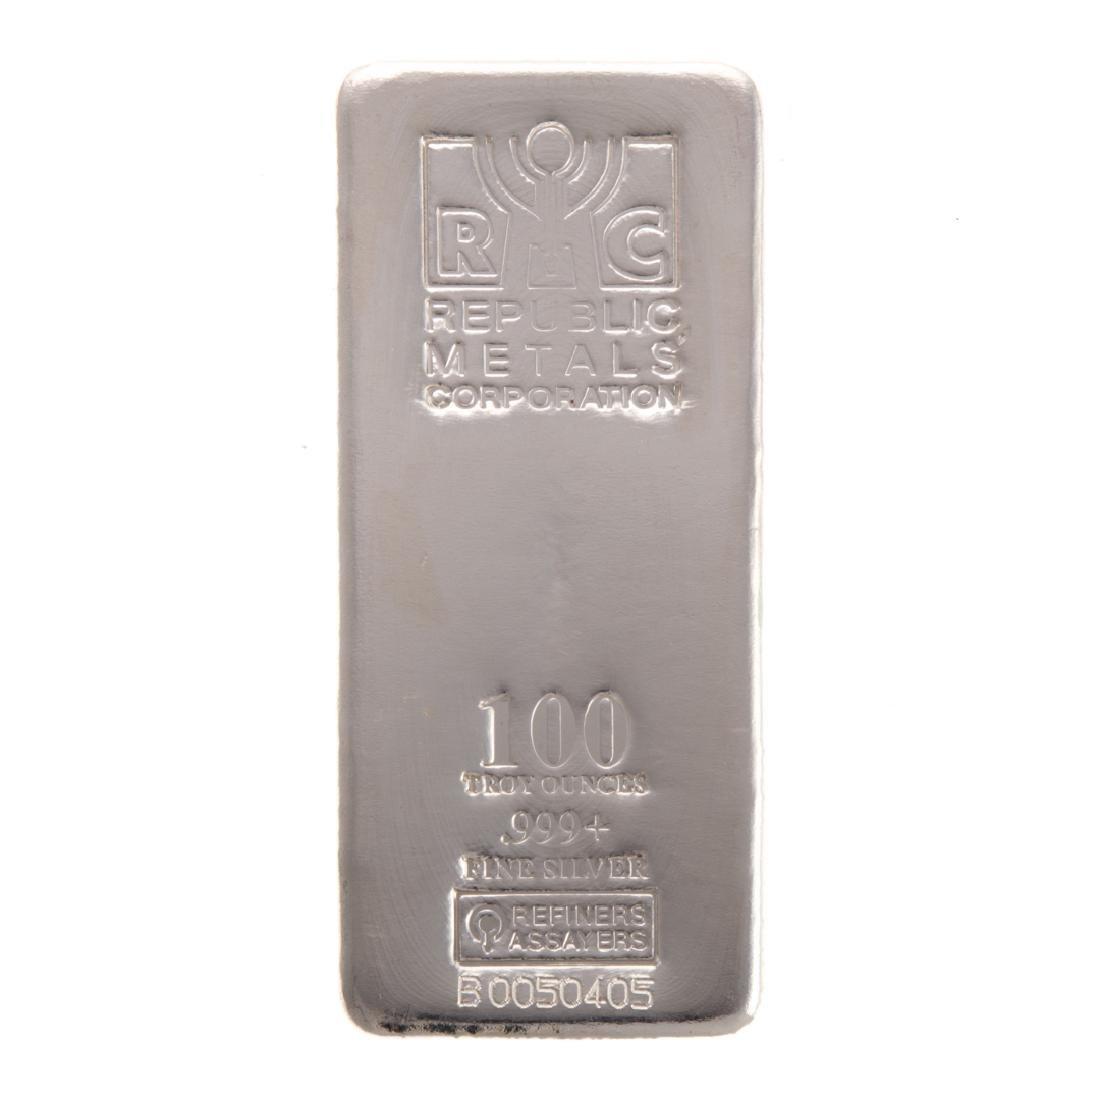 [US] 100 Oz .999+ Silver Bar by Republic Metals